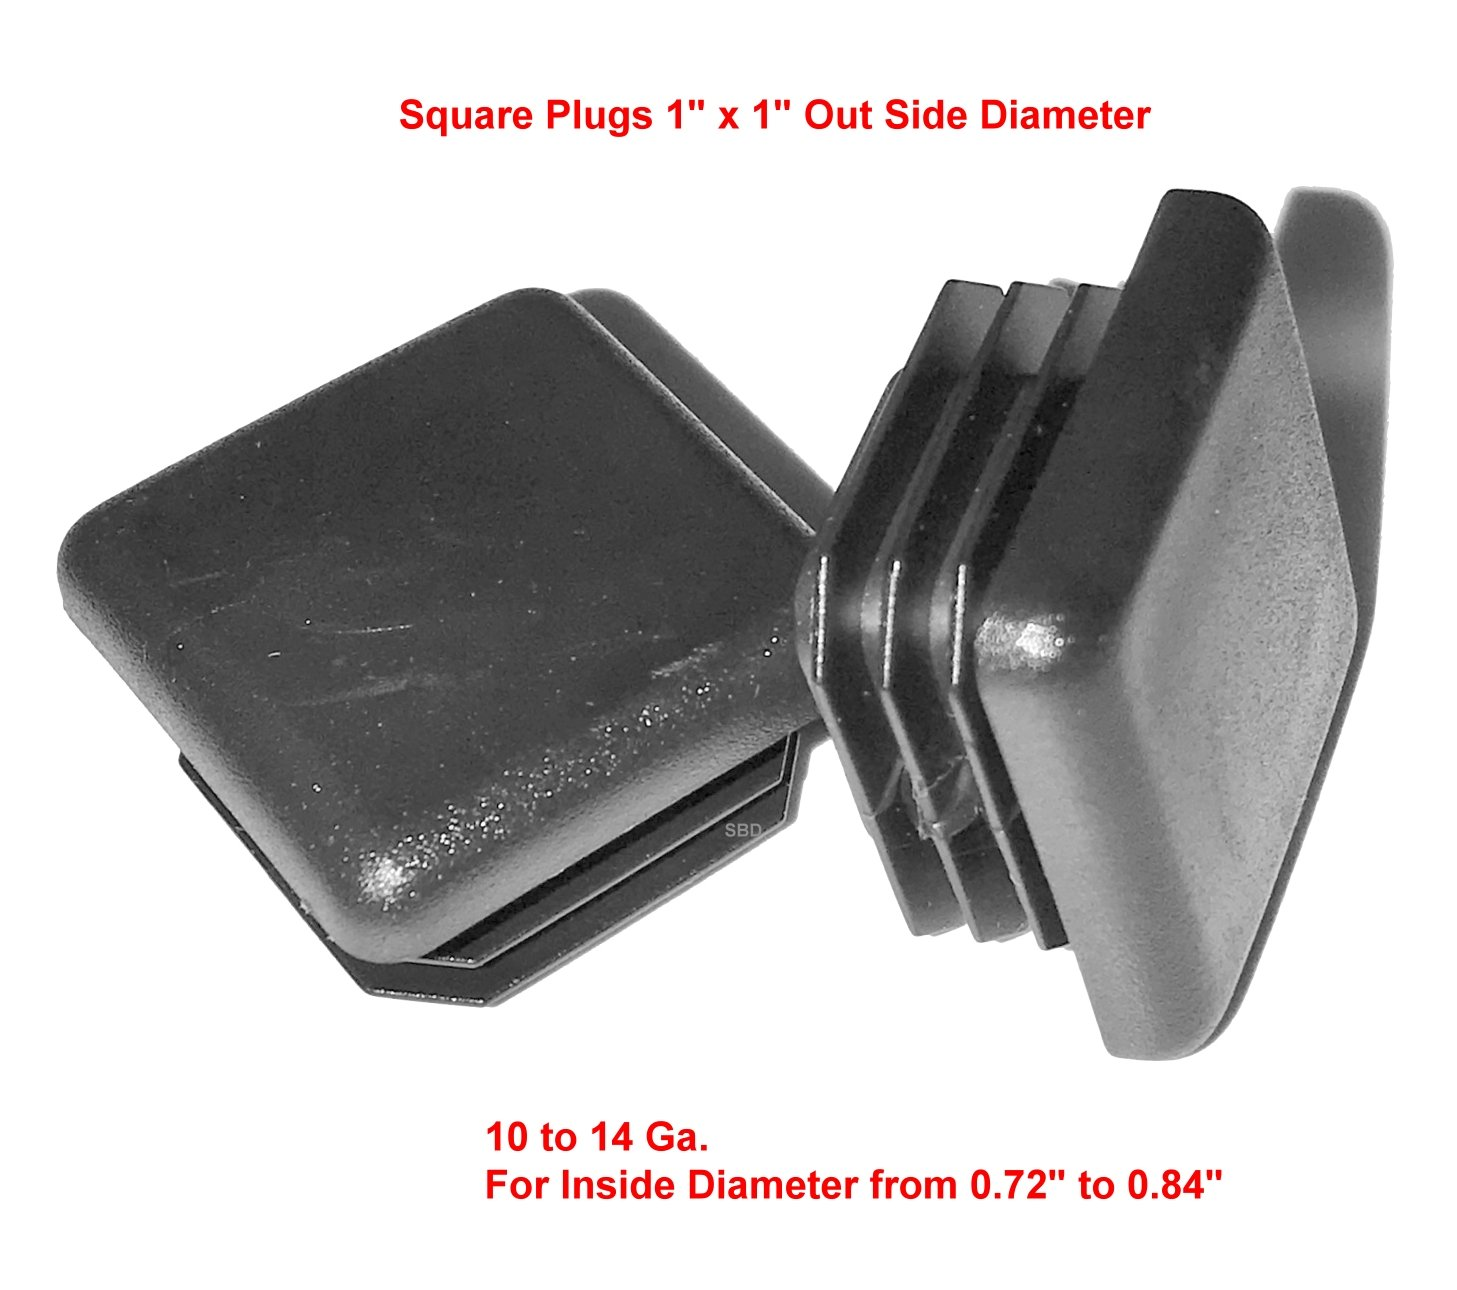 1.5 inch Square Plastic Tubing Plug End Cap Lot of 10